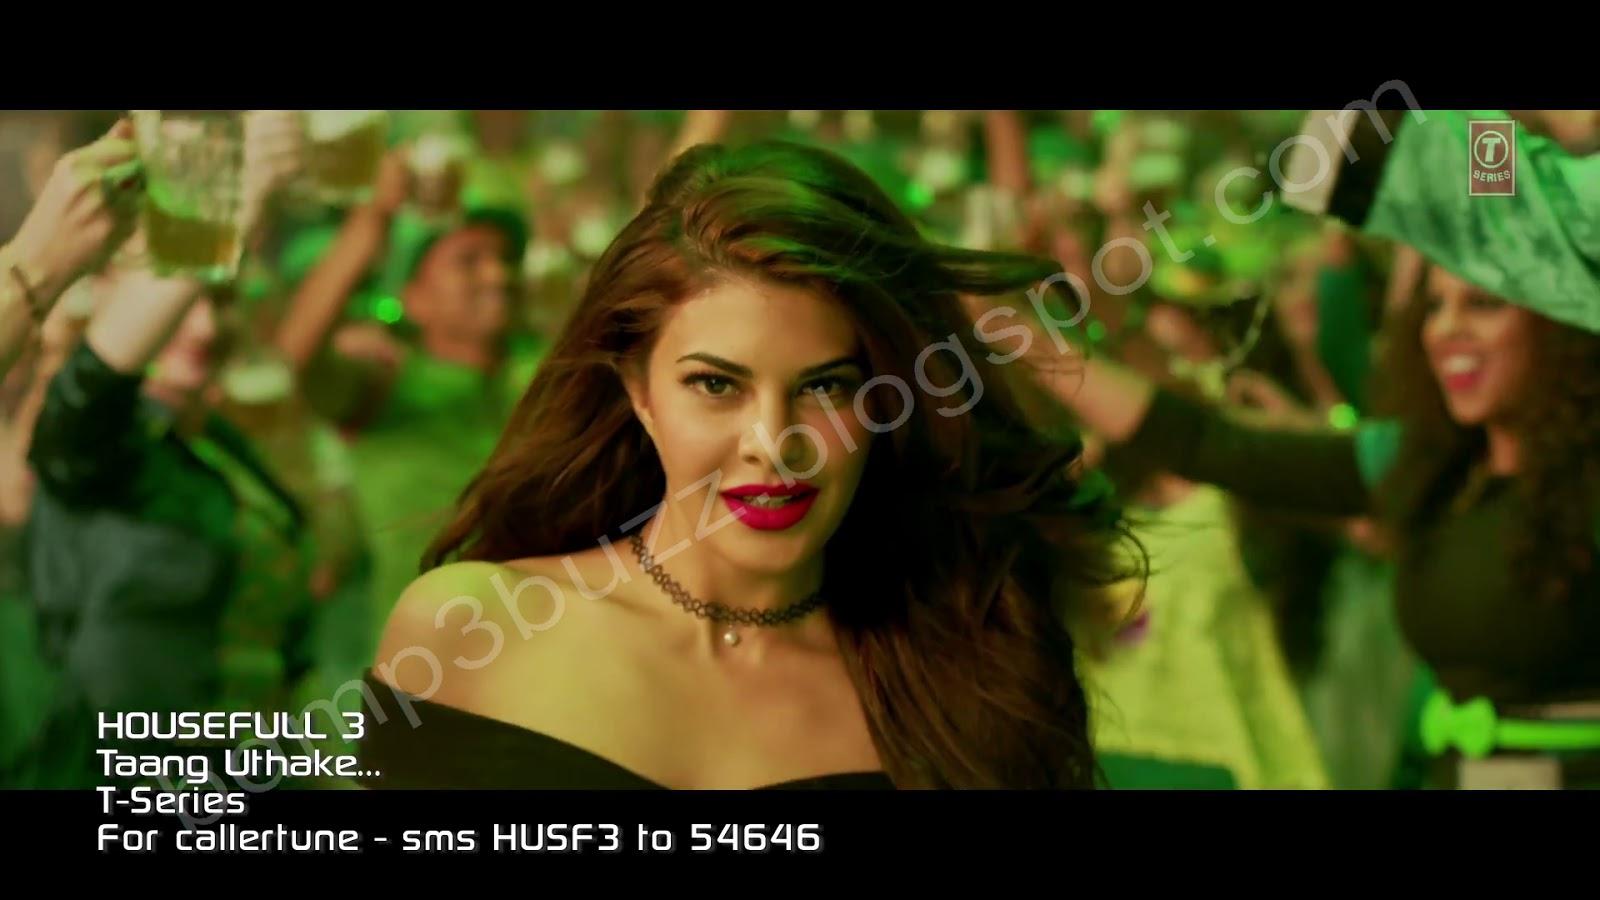 Taang Uthakehousefull Hindi Songnew Moviehd Songmovie